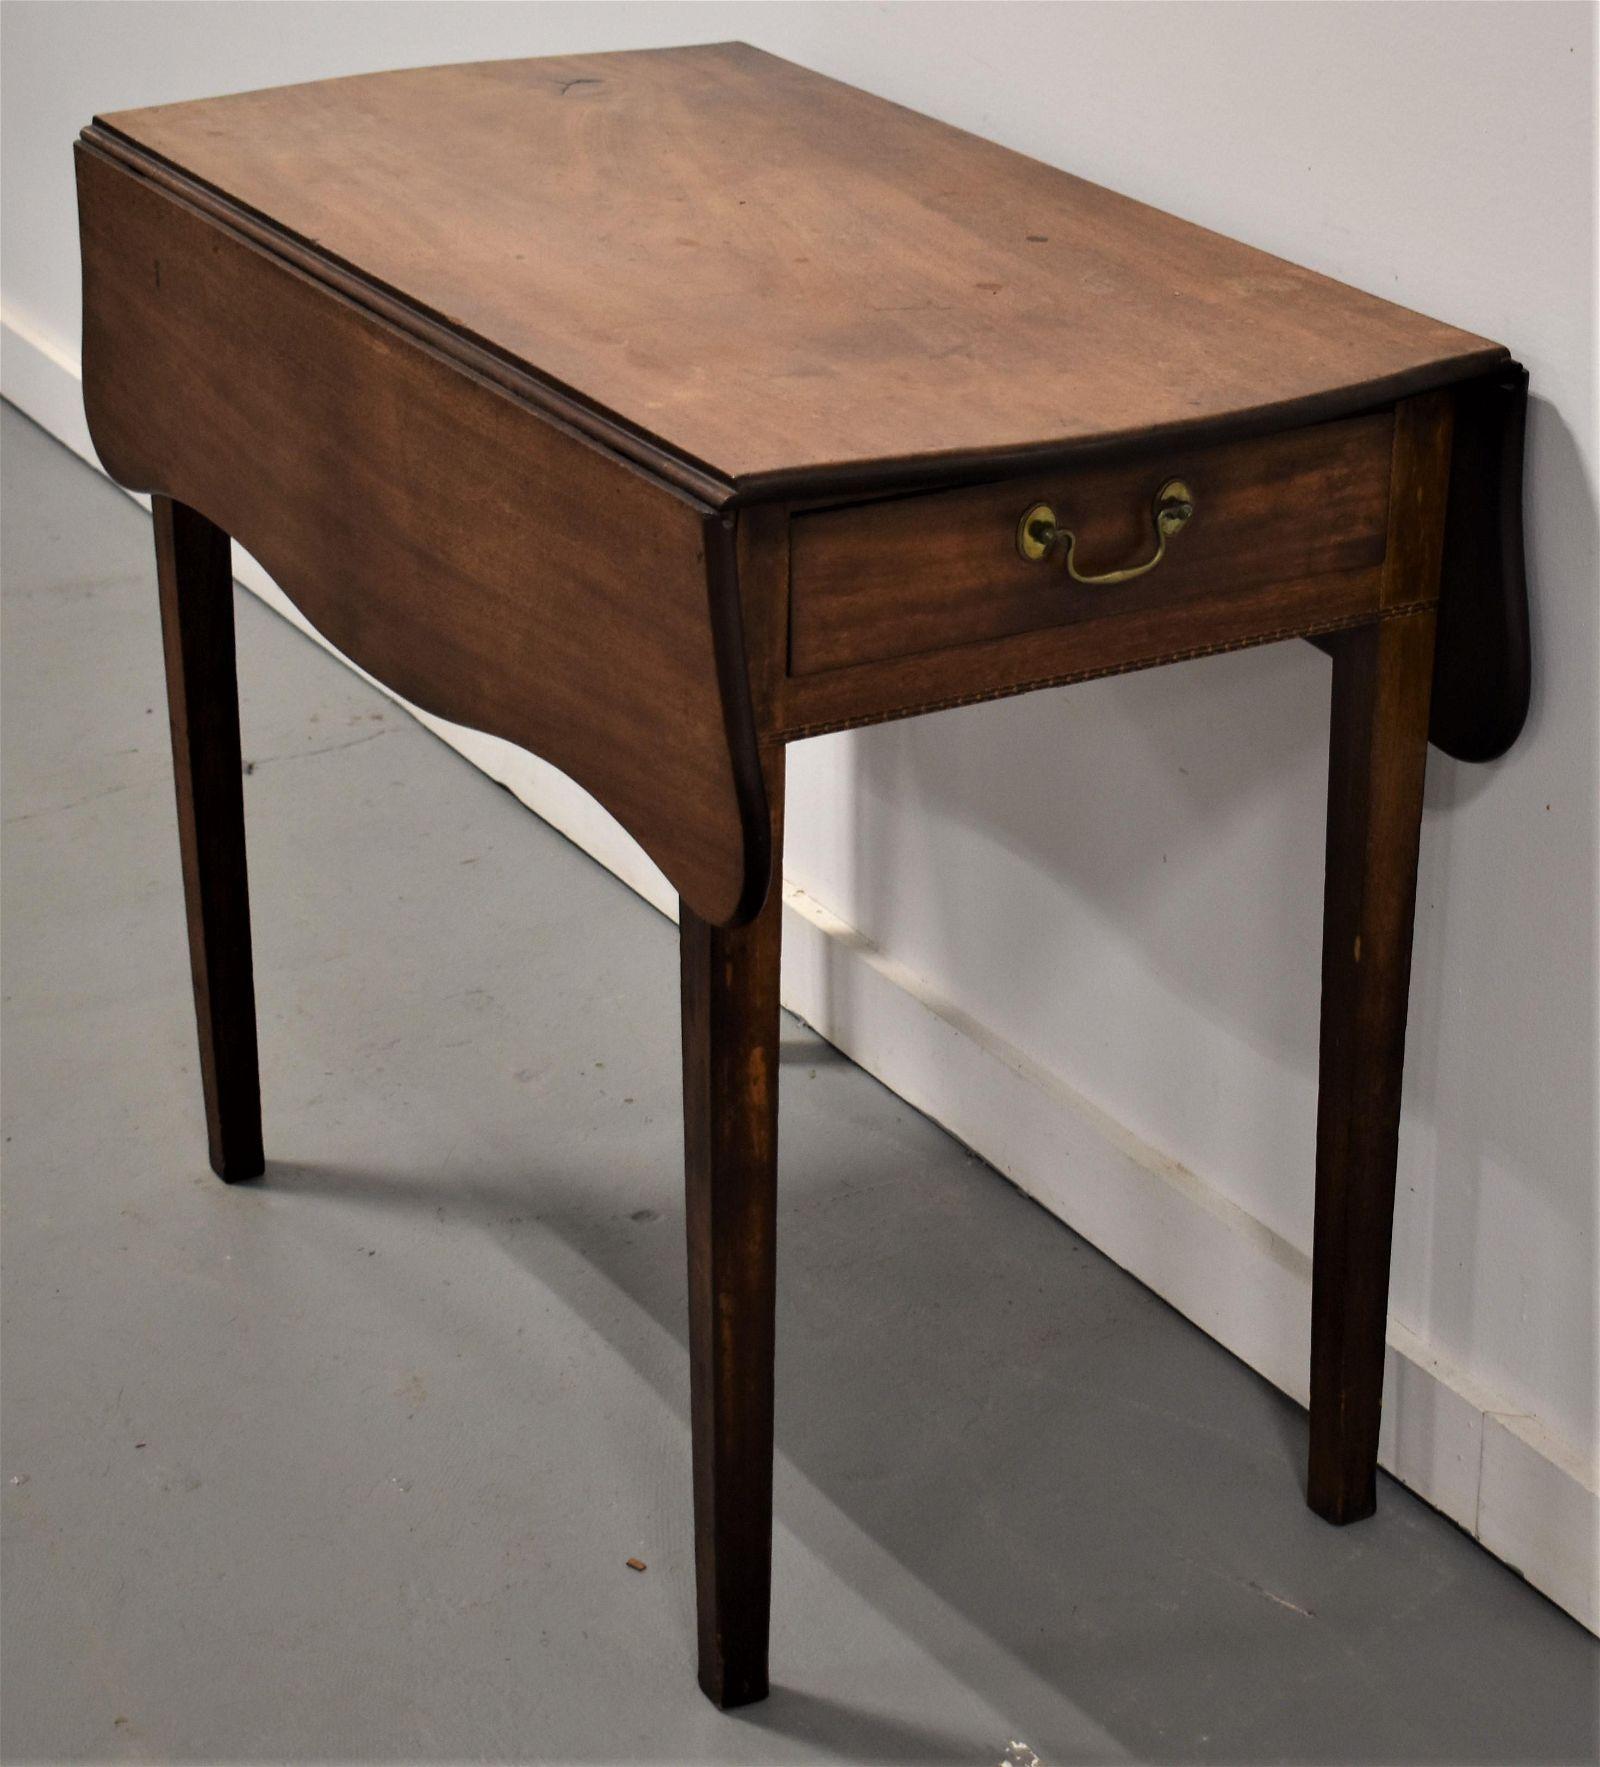 N.E. Cherry Inlaid Pembroke Table